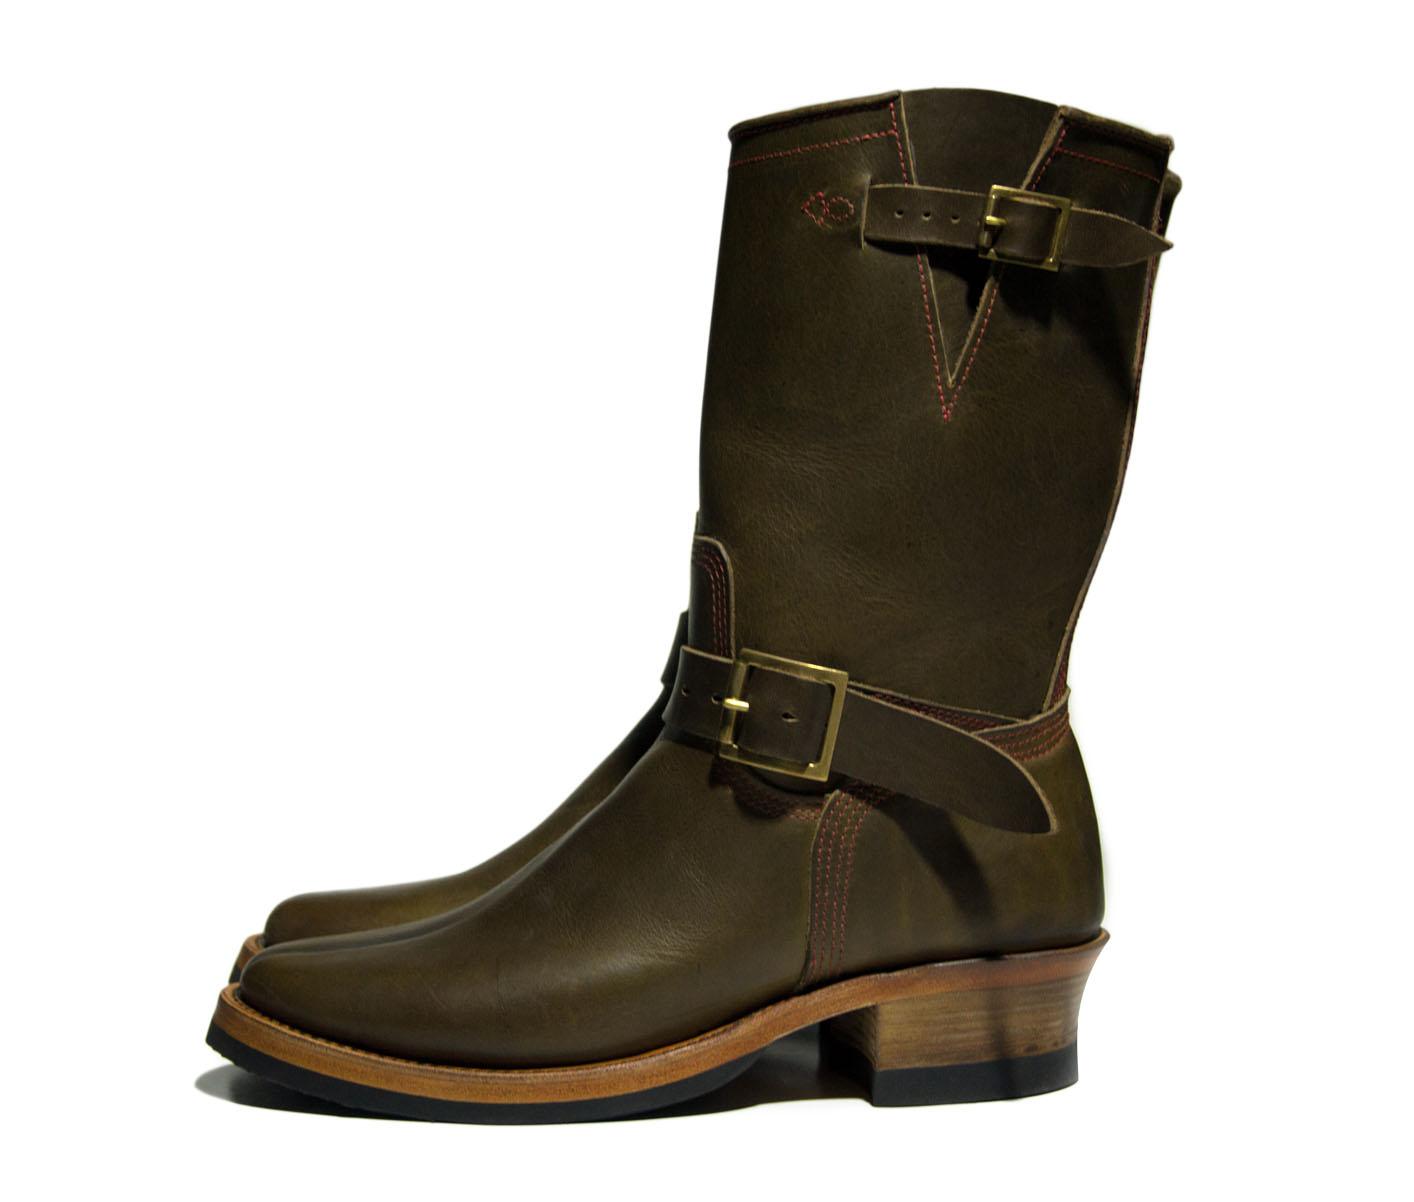 green  boot profile.jpg